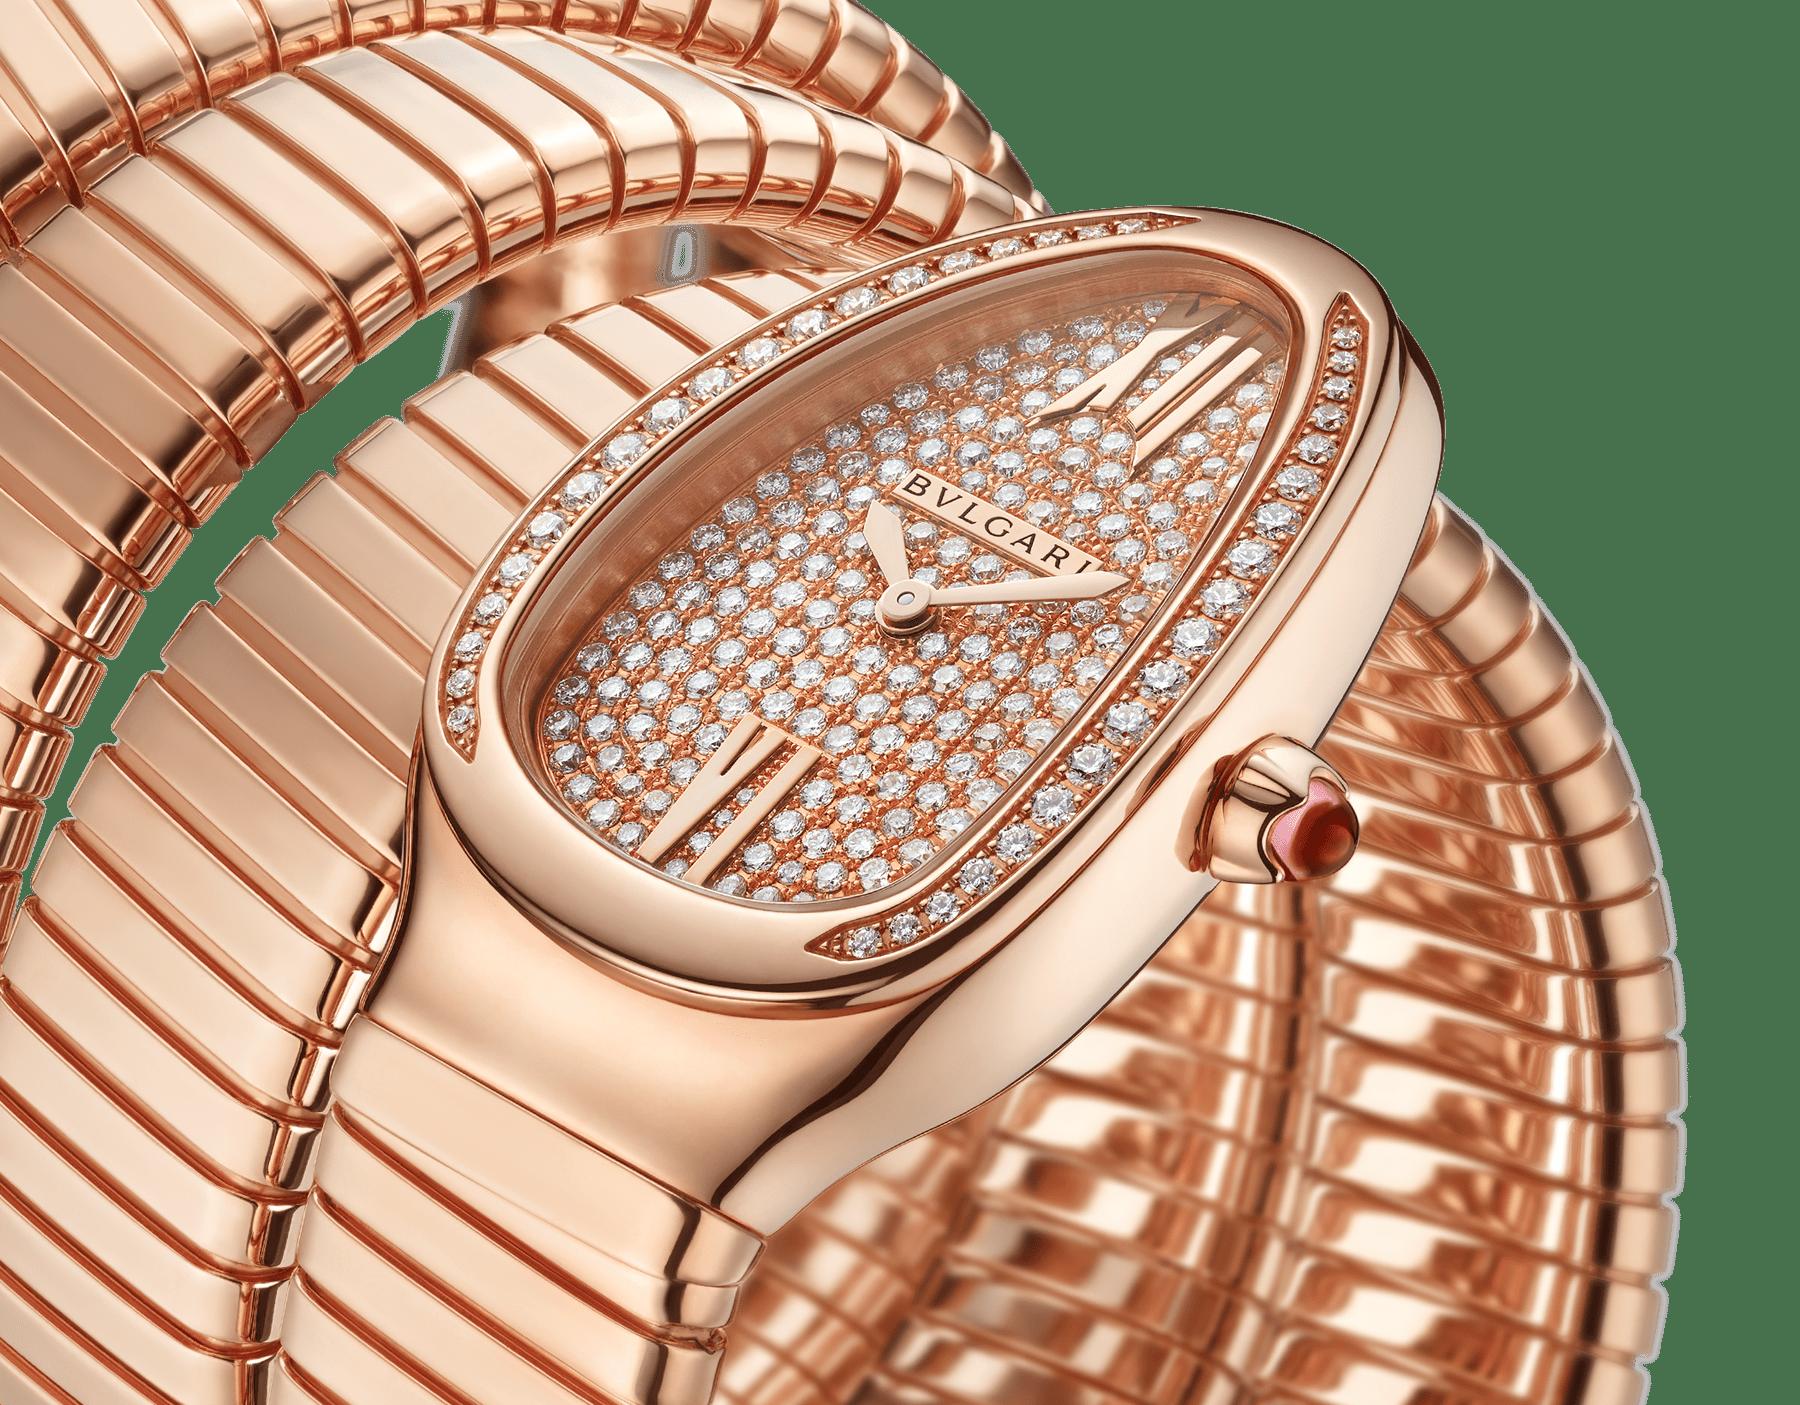 Serpenti Tubogas 七圈螺旋腕錶,18K 玫瑰金錶殼鑲飾明亮型切割鑽石,18K 玫瑰金錶盤鑲飾全密鑲明亮型切割鑽石,18K 玫瑰金錶帶。 101938 image 2